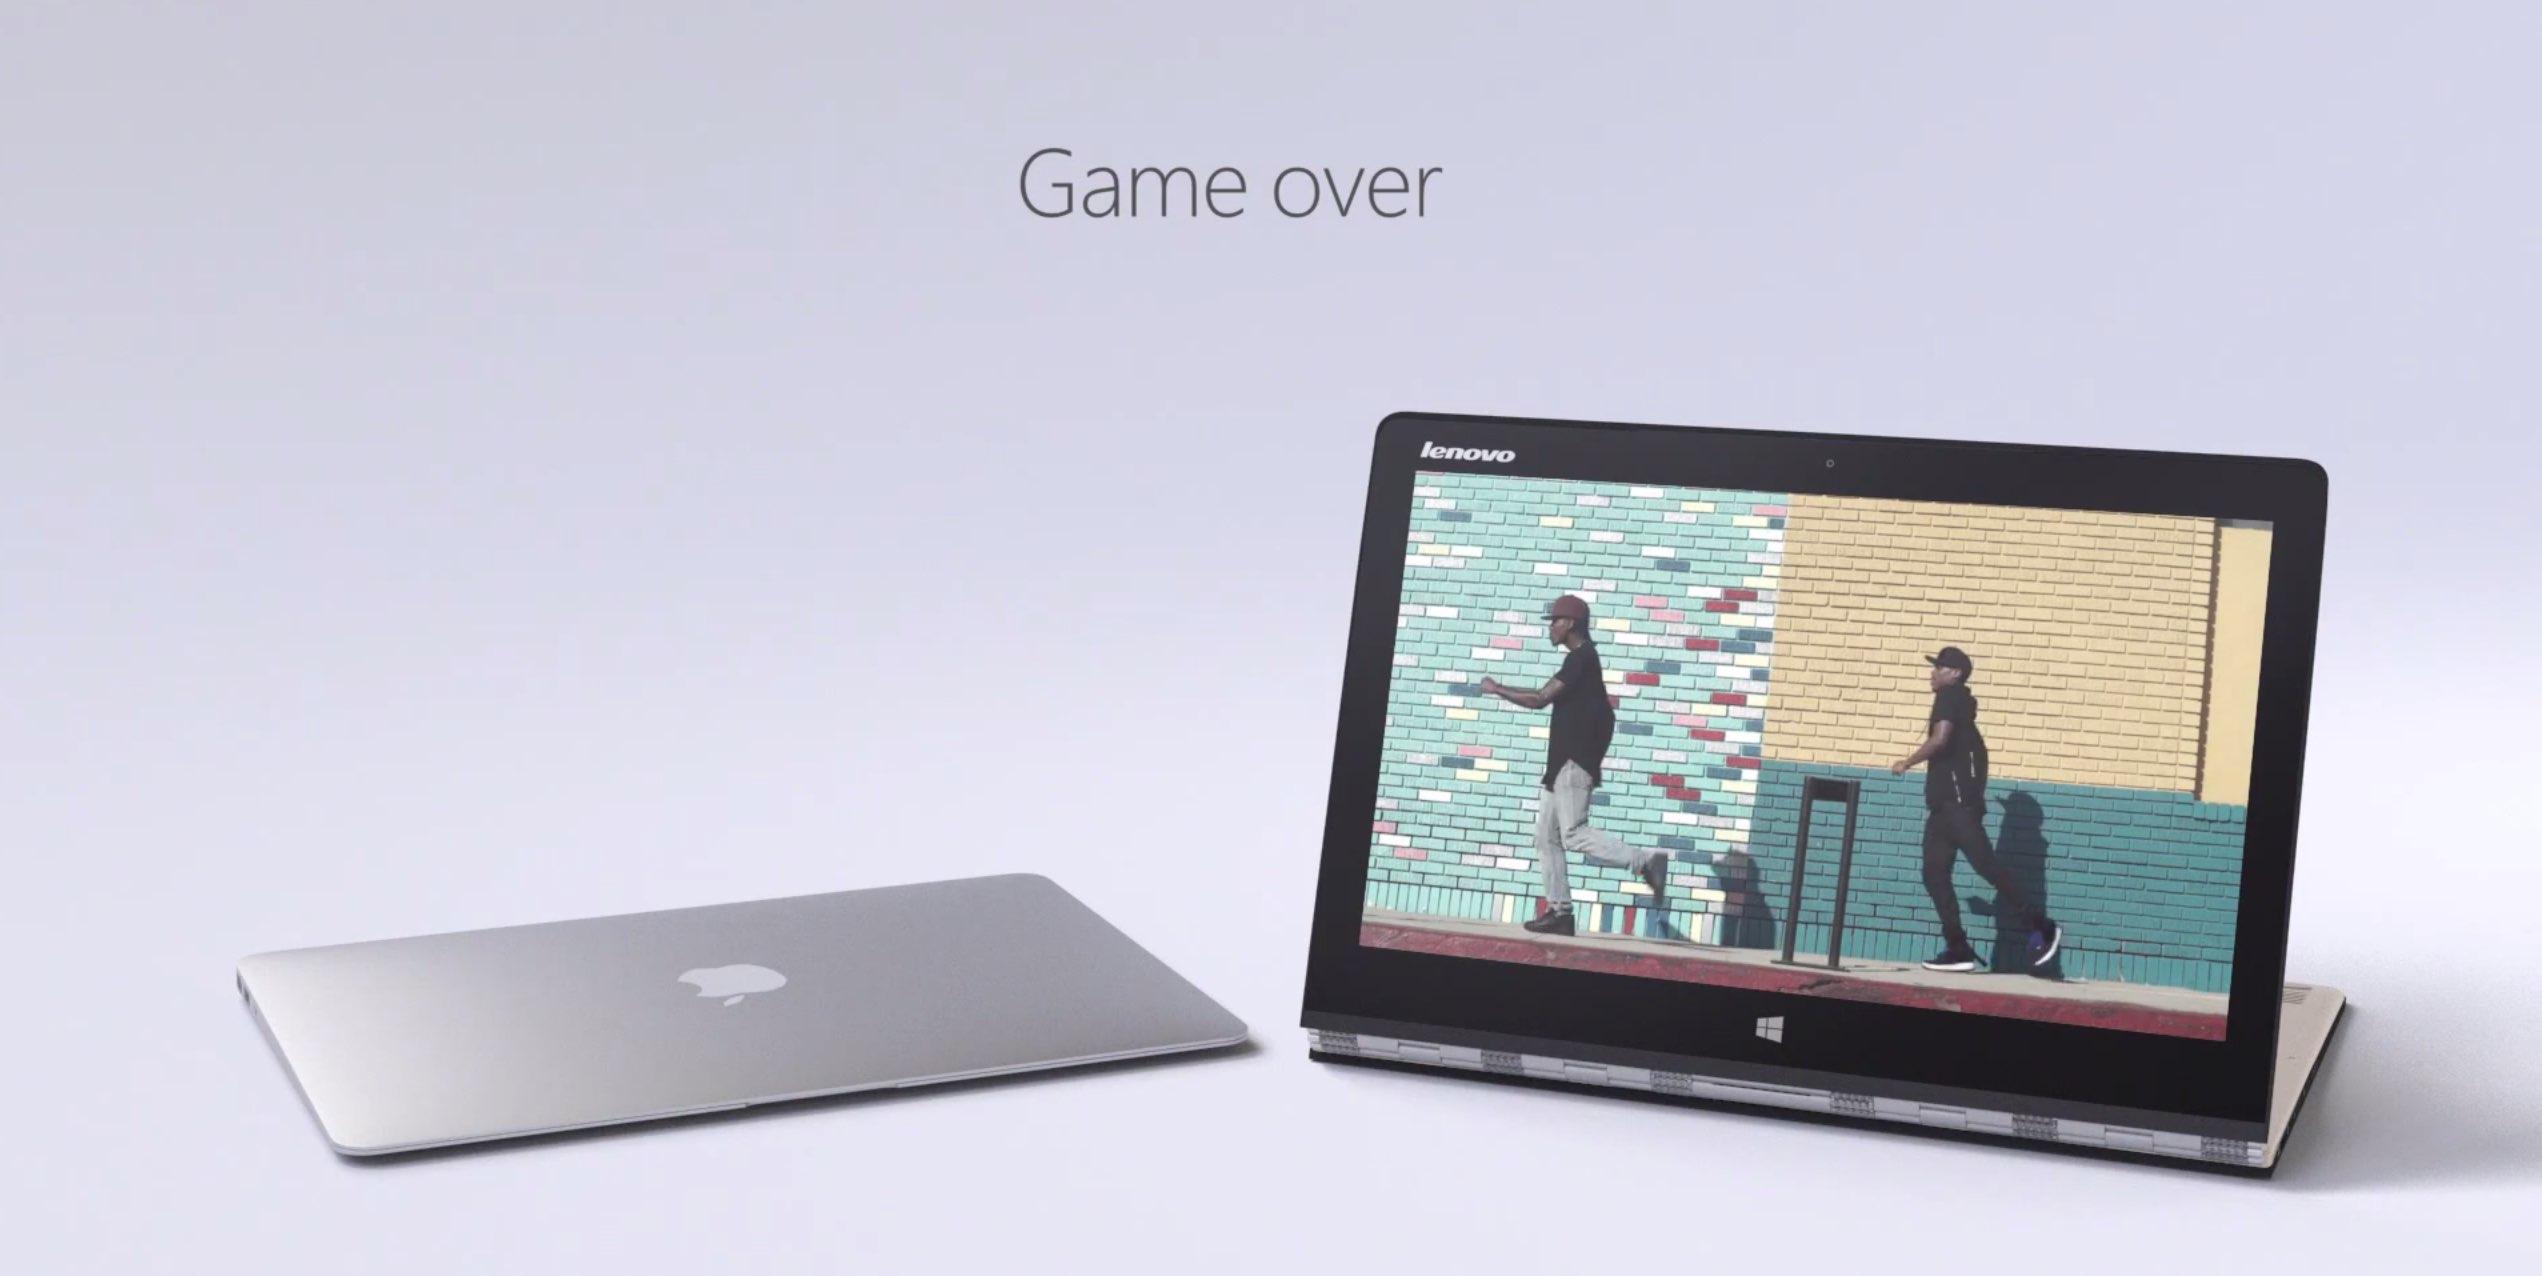 Microsoft: Game Over fürs MacBook Air? 6